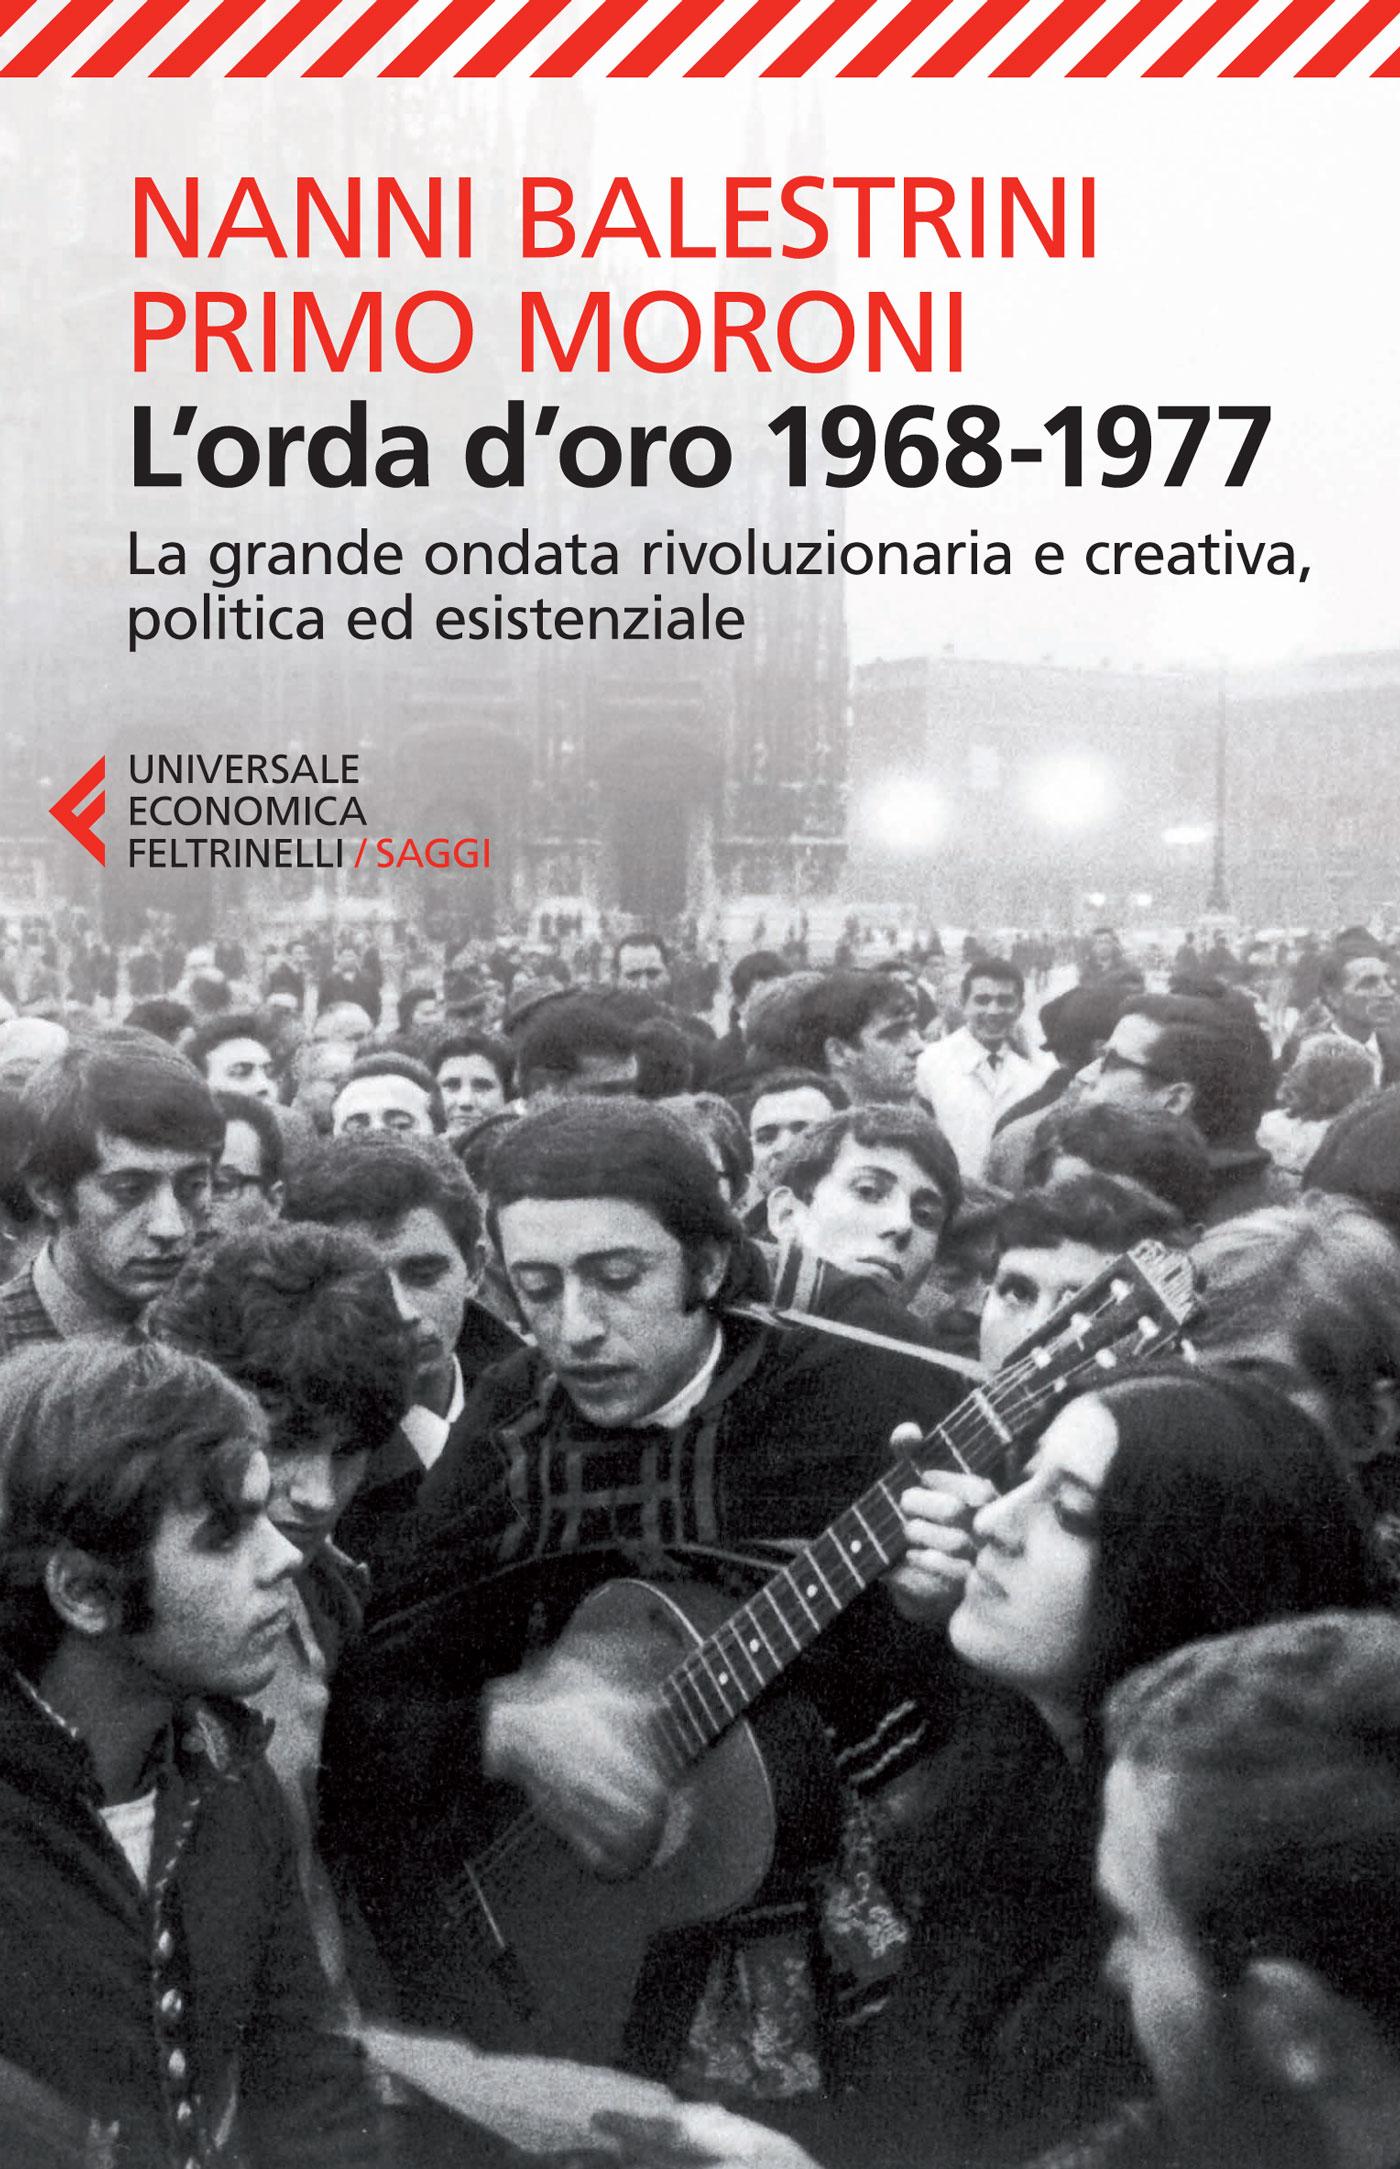 L'orda d'oro 1968-1977